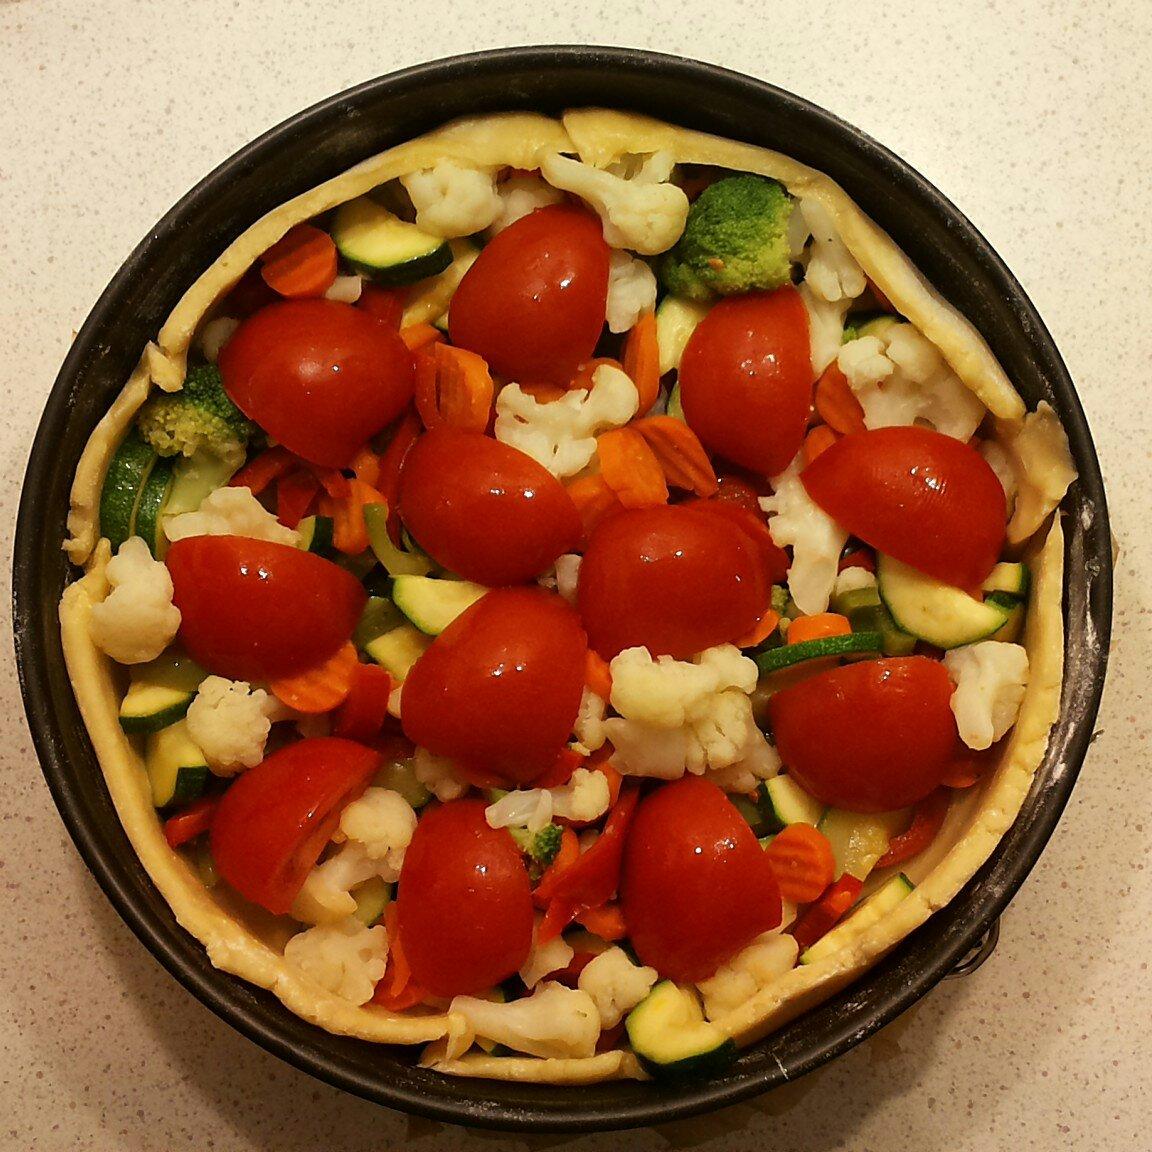 Gemüsekuchen in Backform - gefüllt